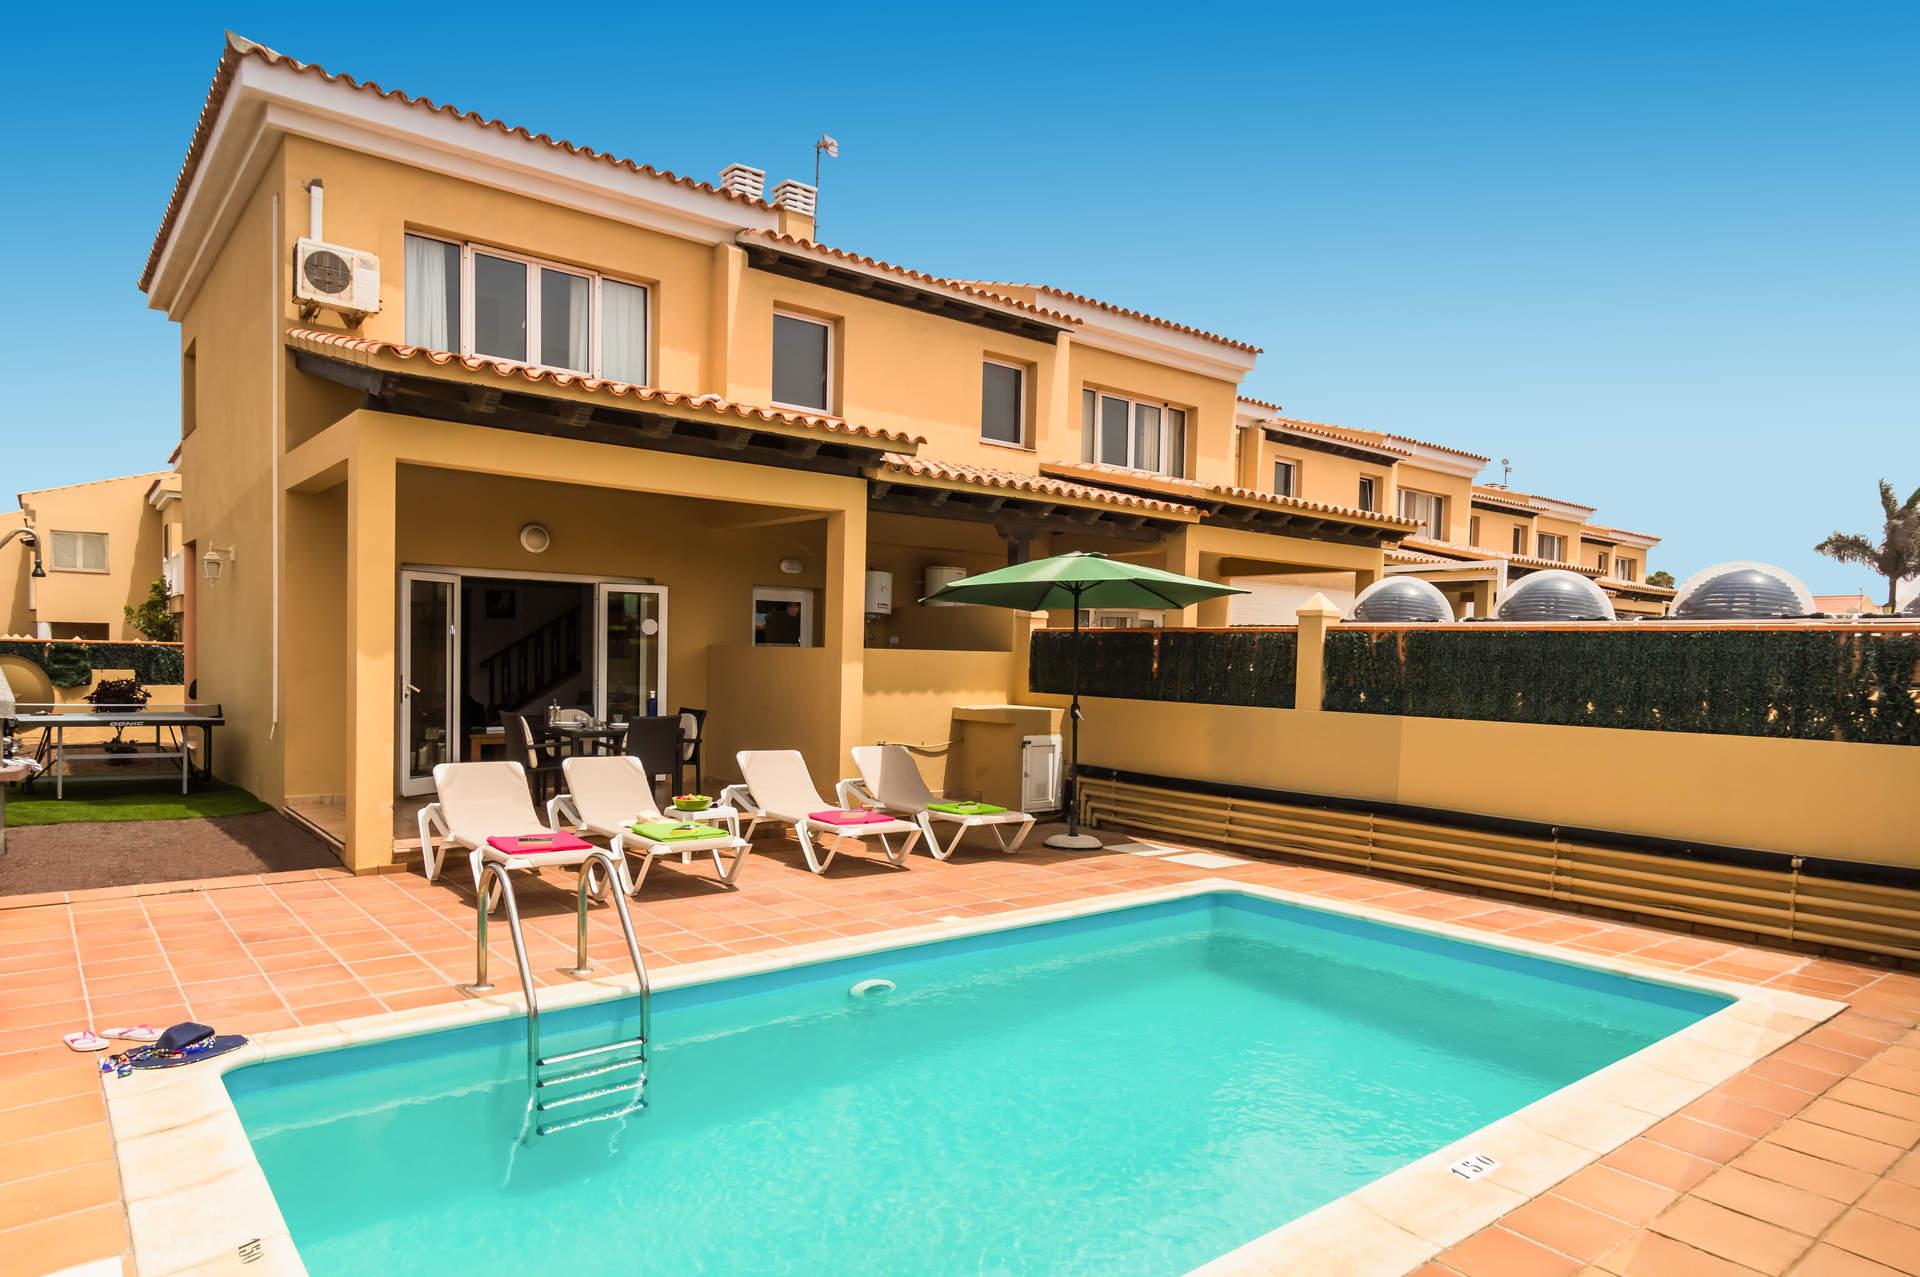 Villa Las Margaritas, Corralejo, Fuerteventura